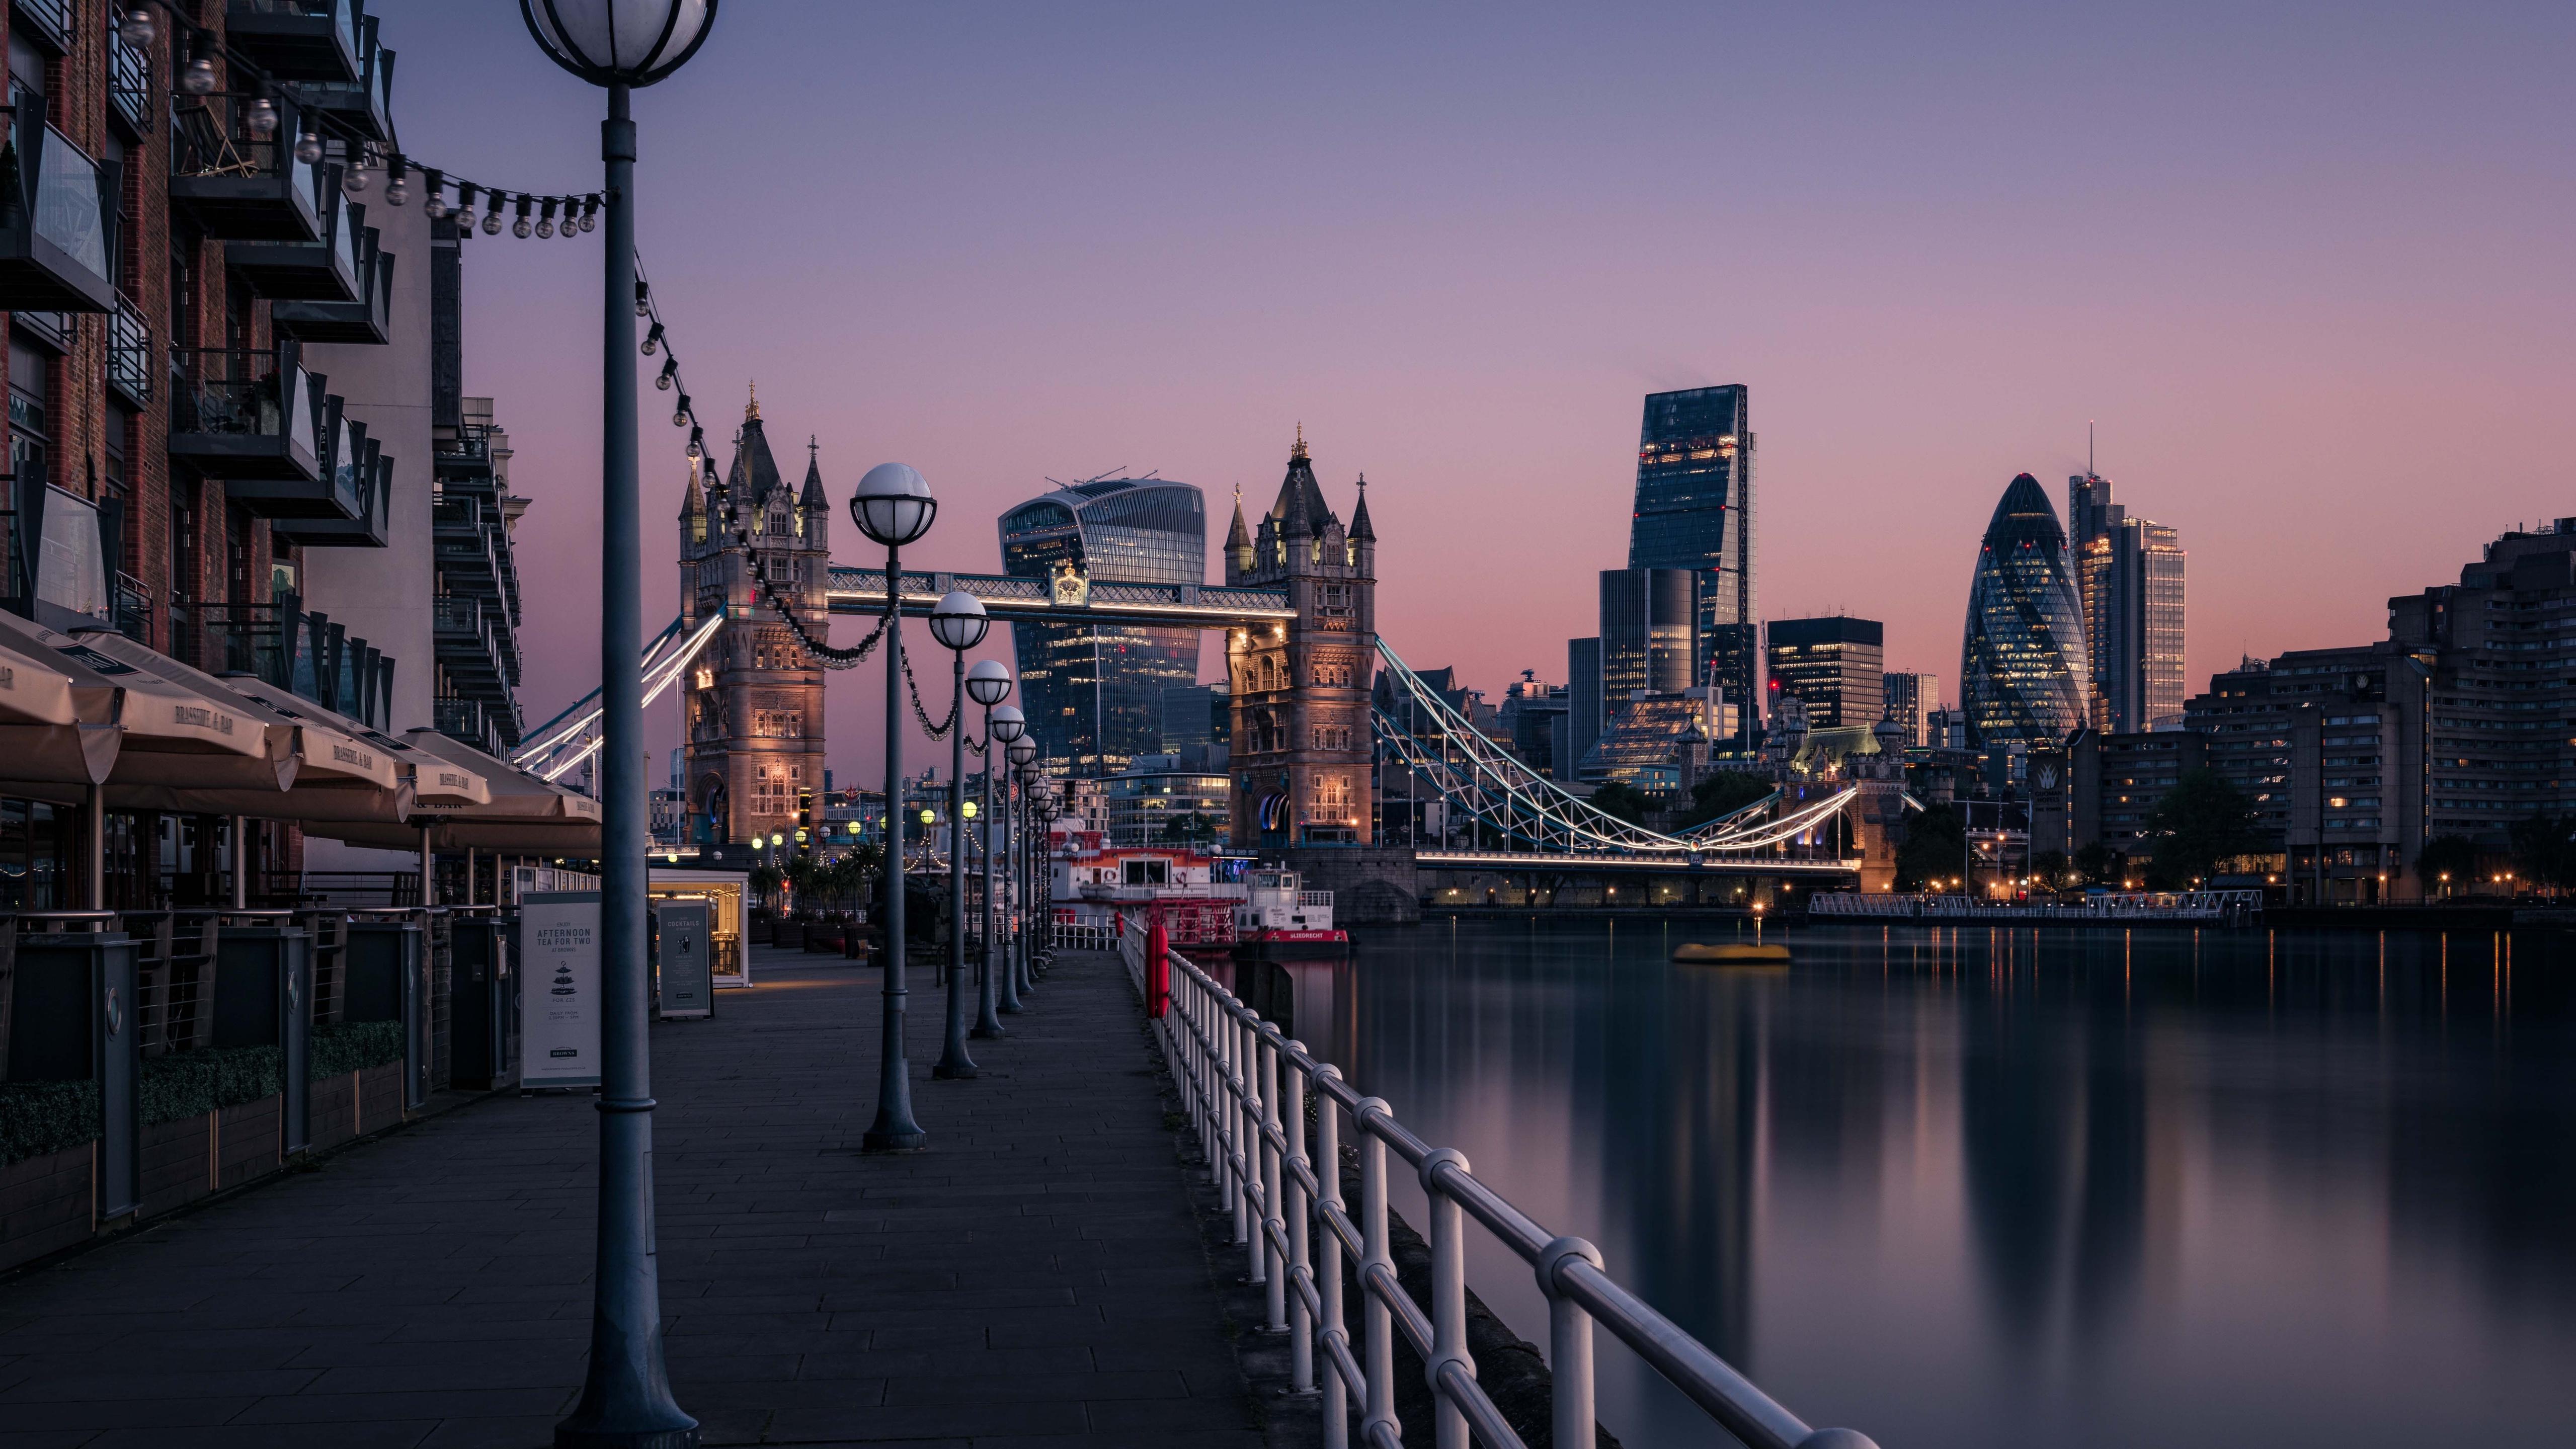 5120x2880 london england tower bridge thames river cityscape urban